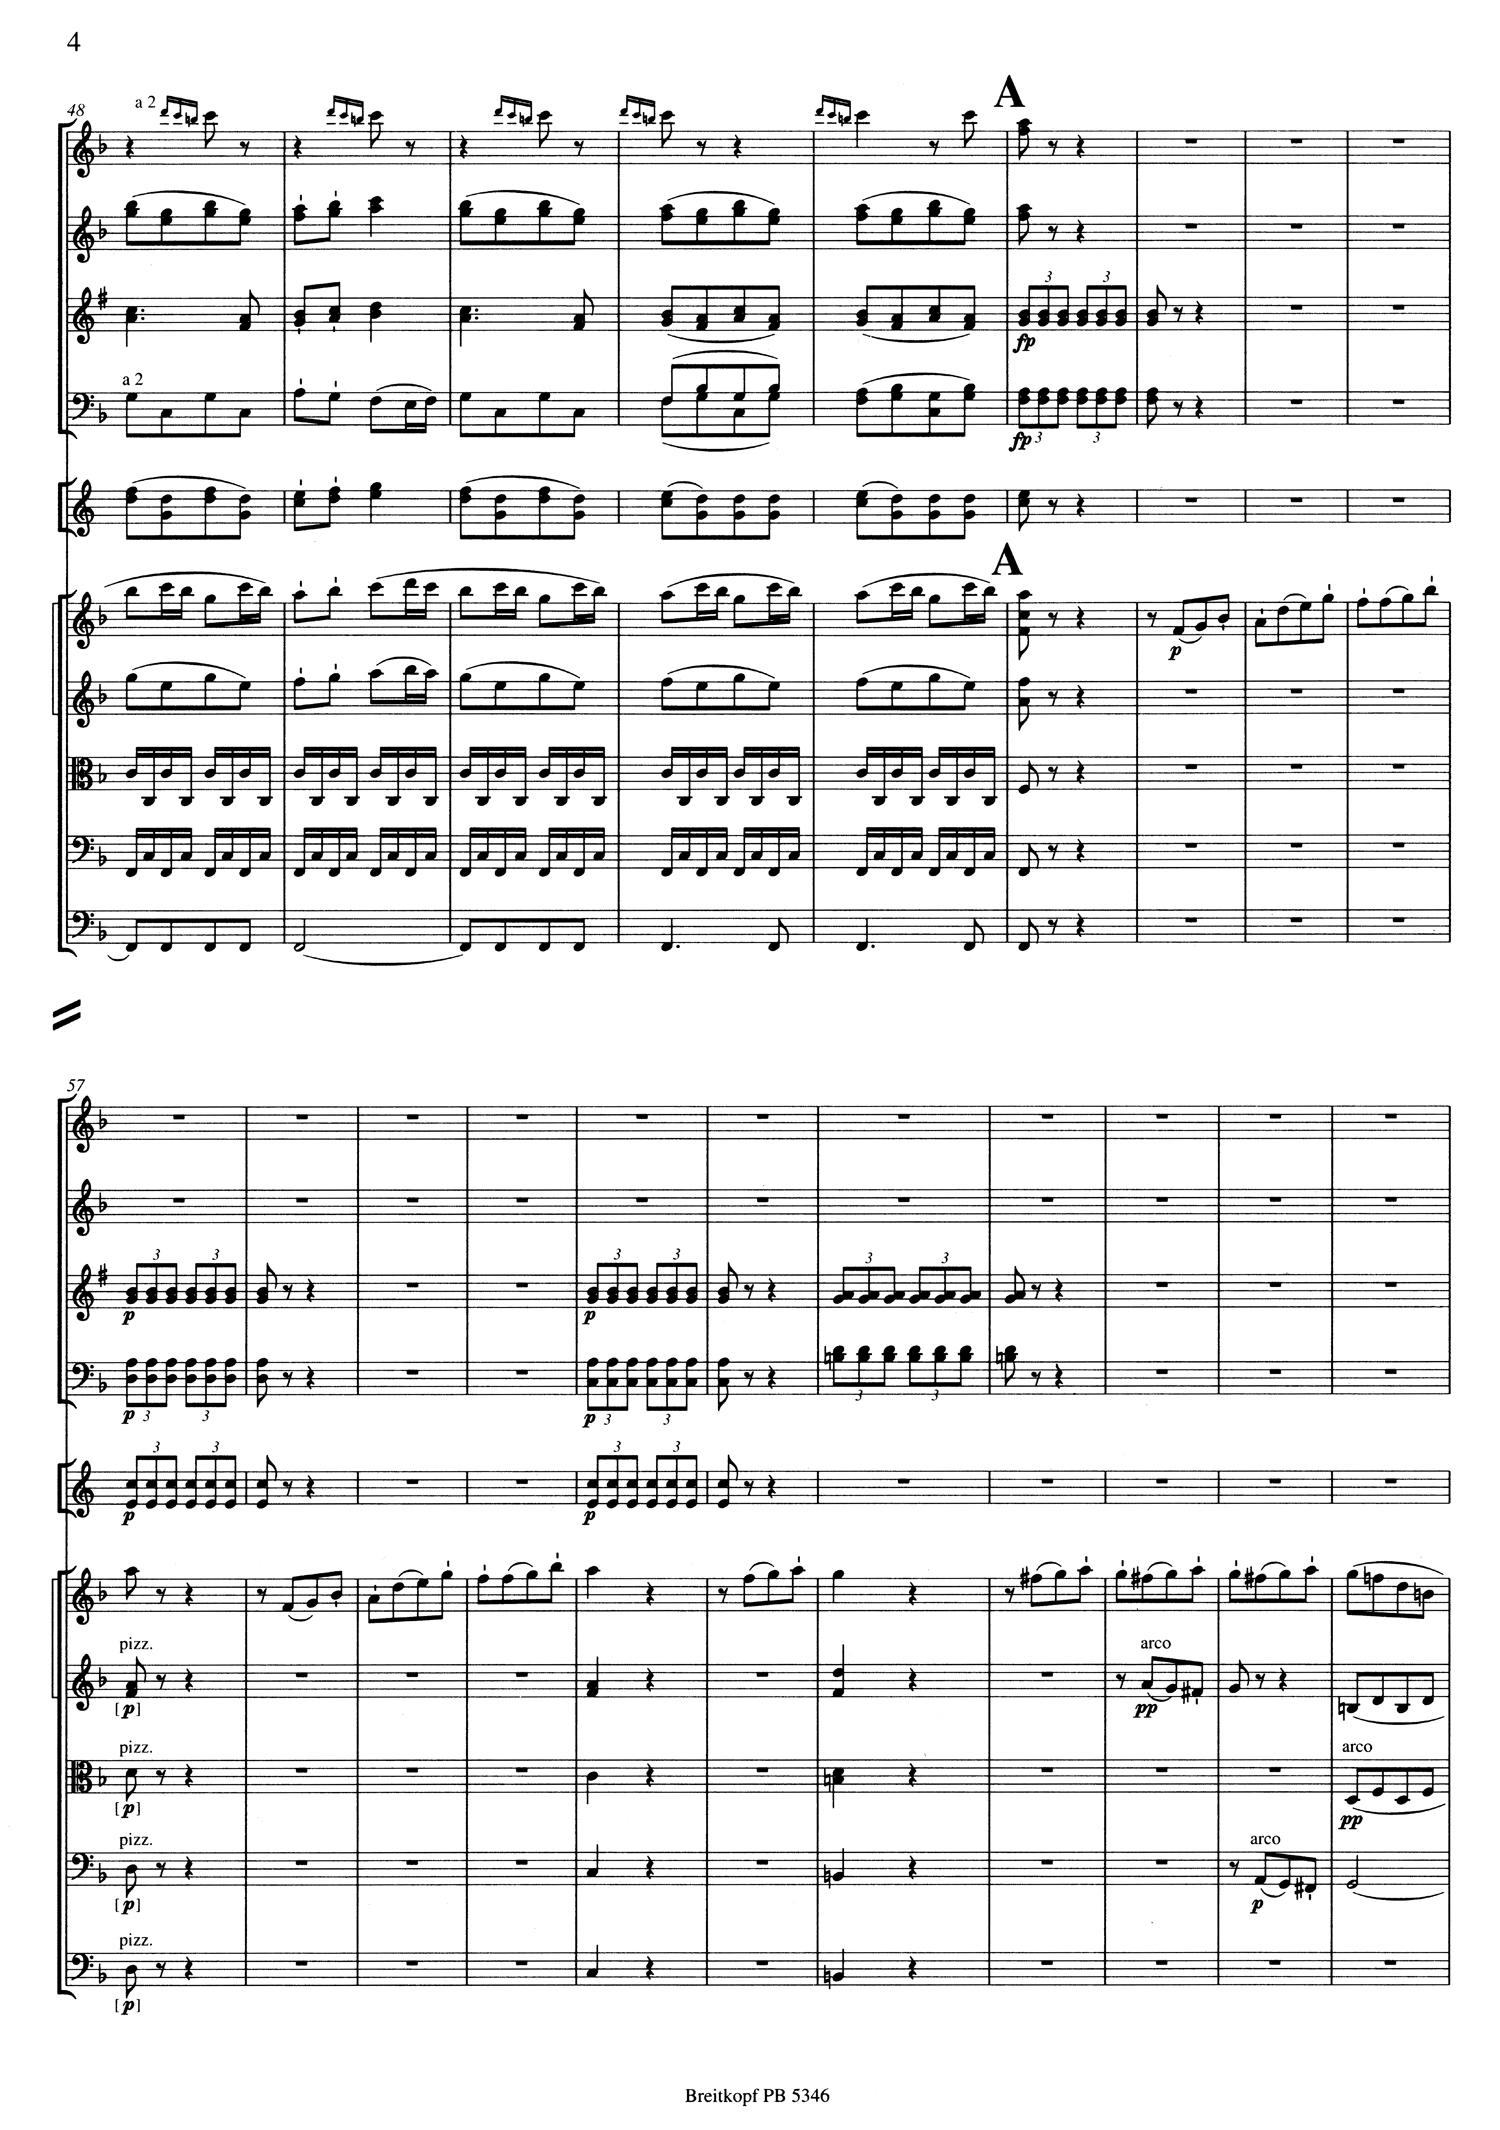 Beethoven 6 Score 2.jpg